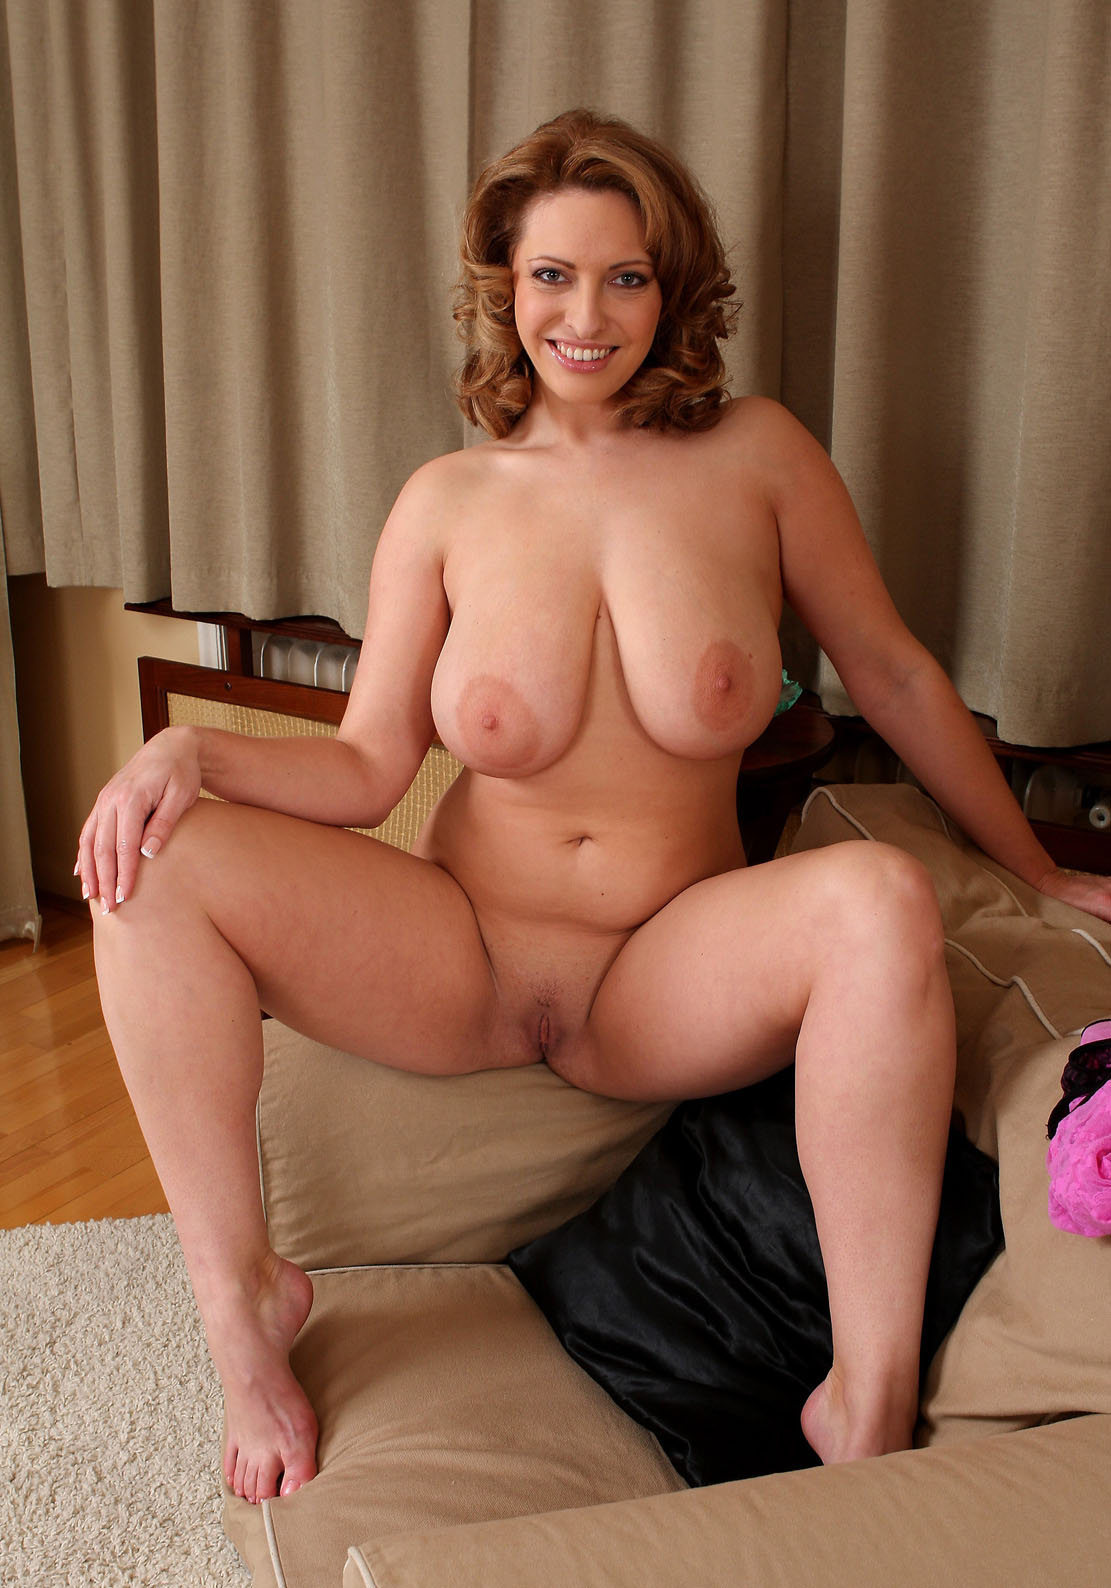 Nudemilf Hot Naked